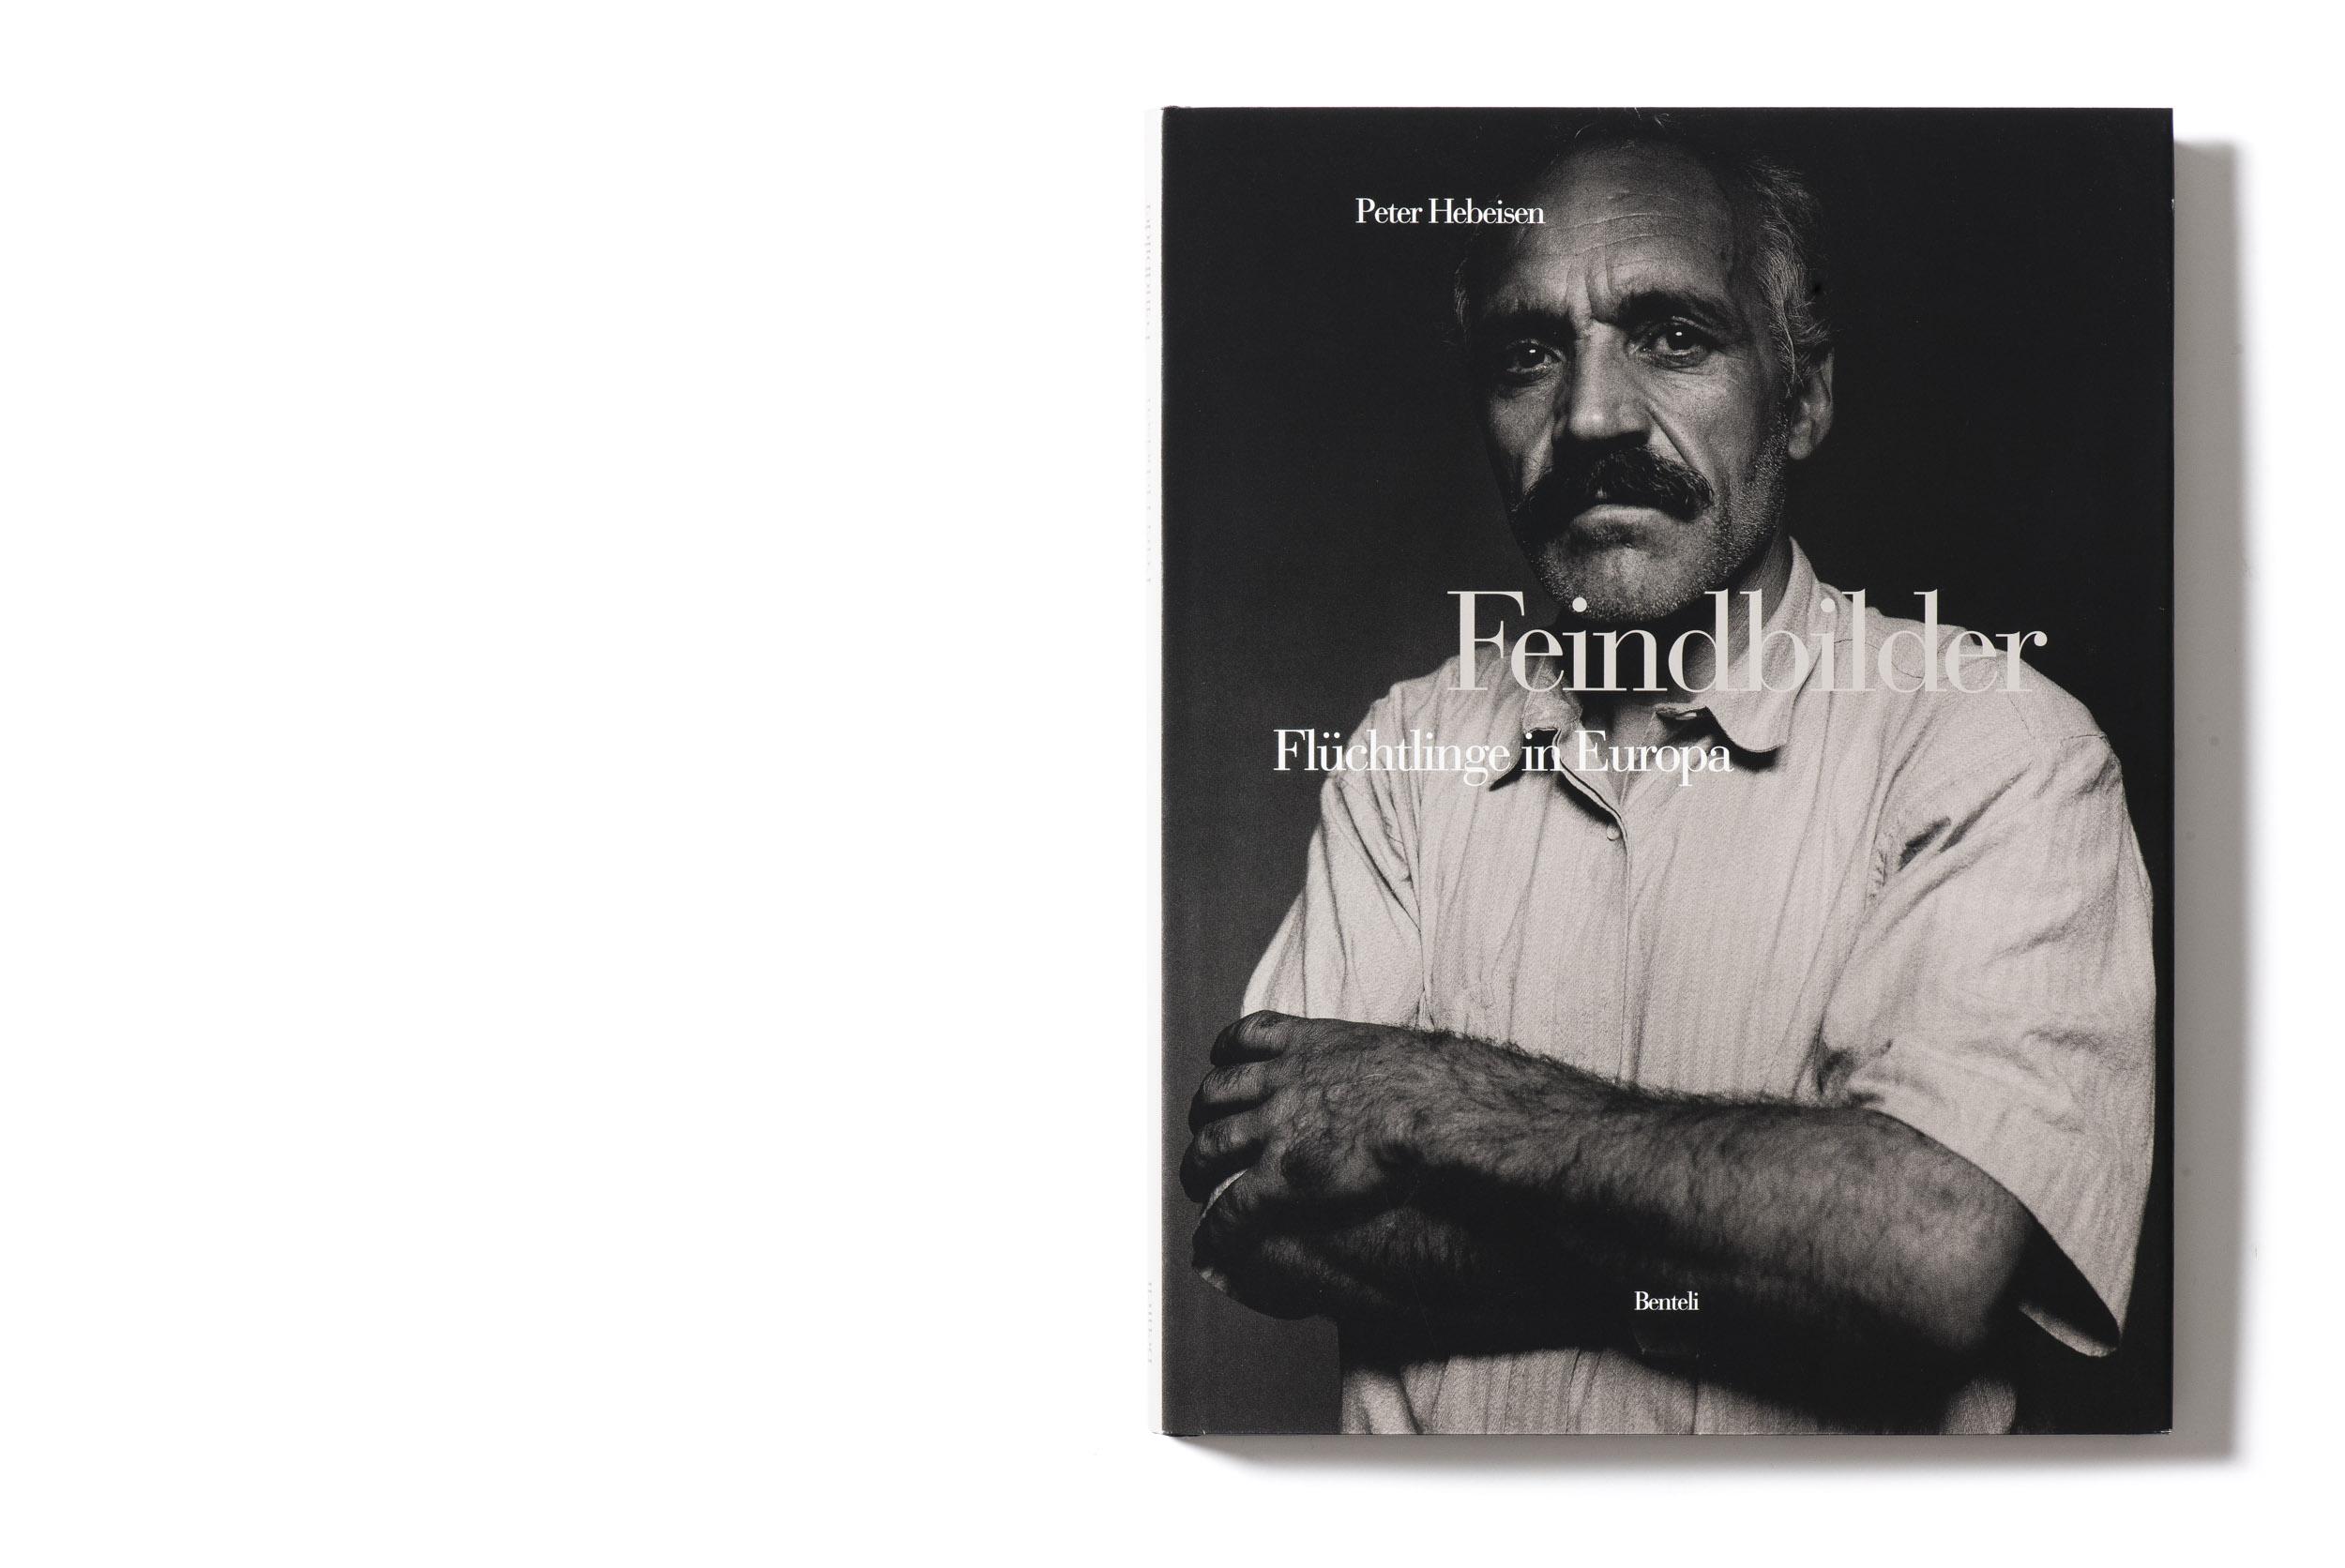 Kunstband Fotografien Peter Hebeisen Titel Feindbilder